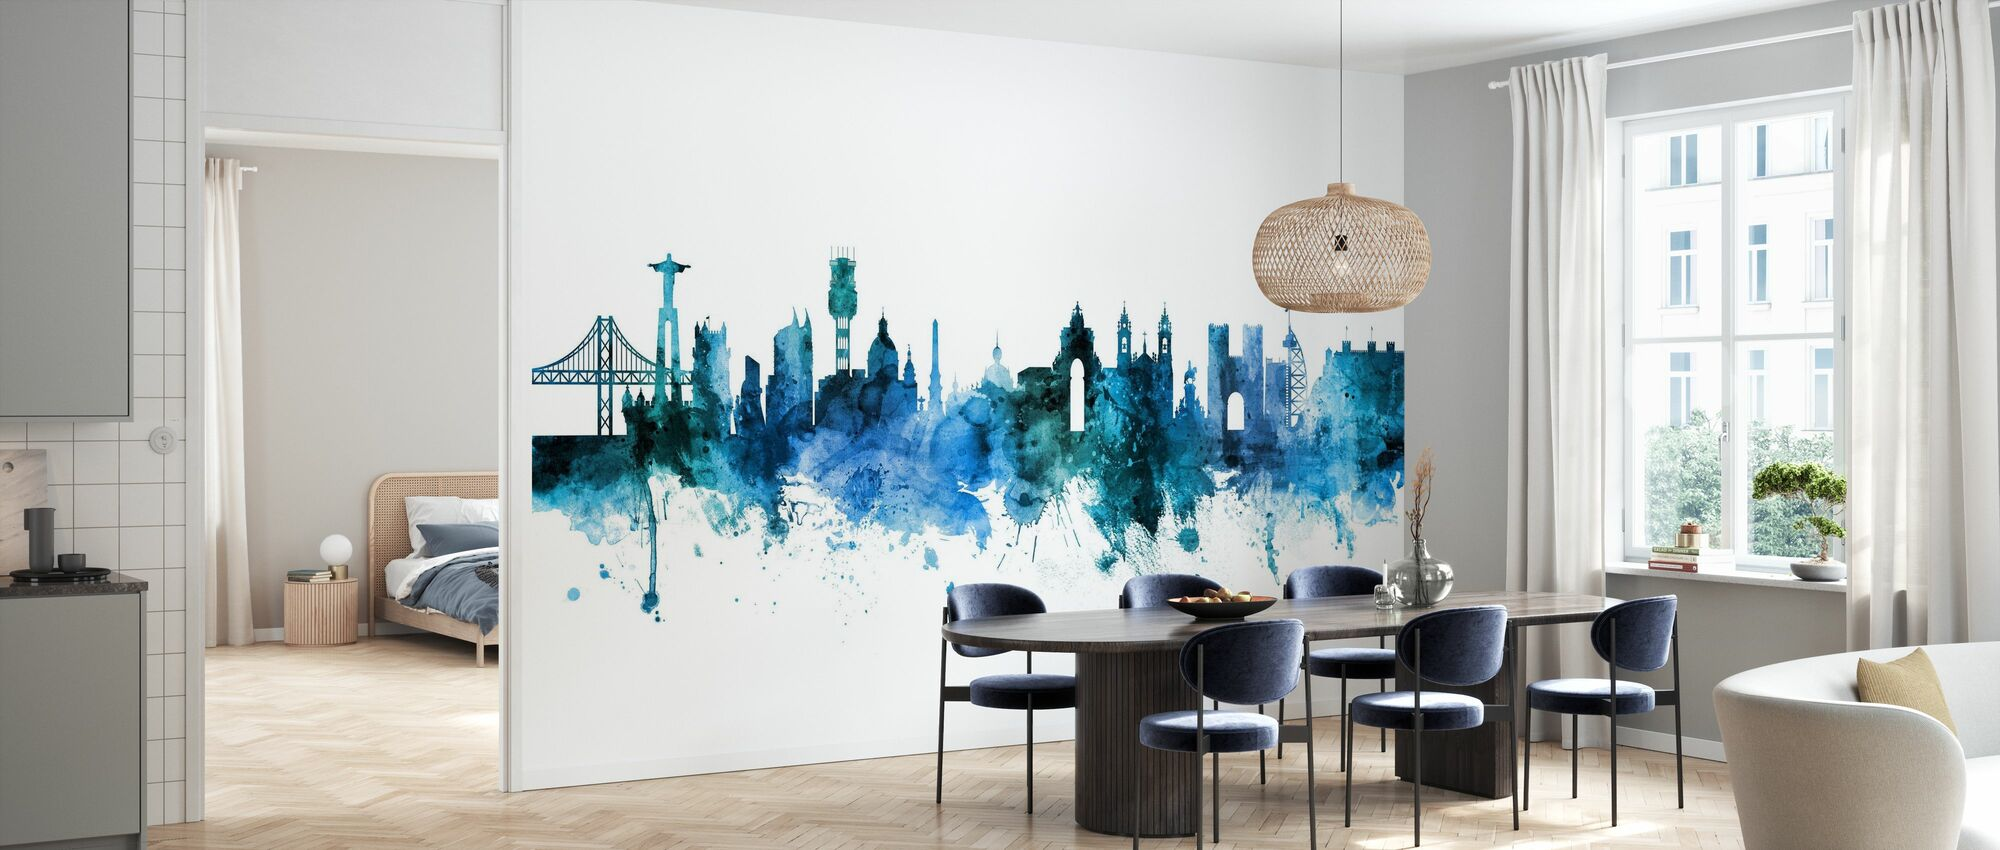 Lisboa Portugal Skyline - Papel pintado - Cocina